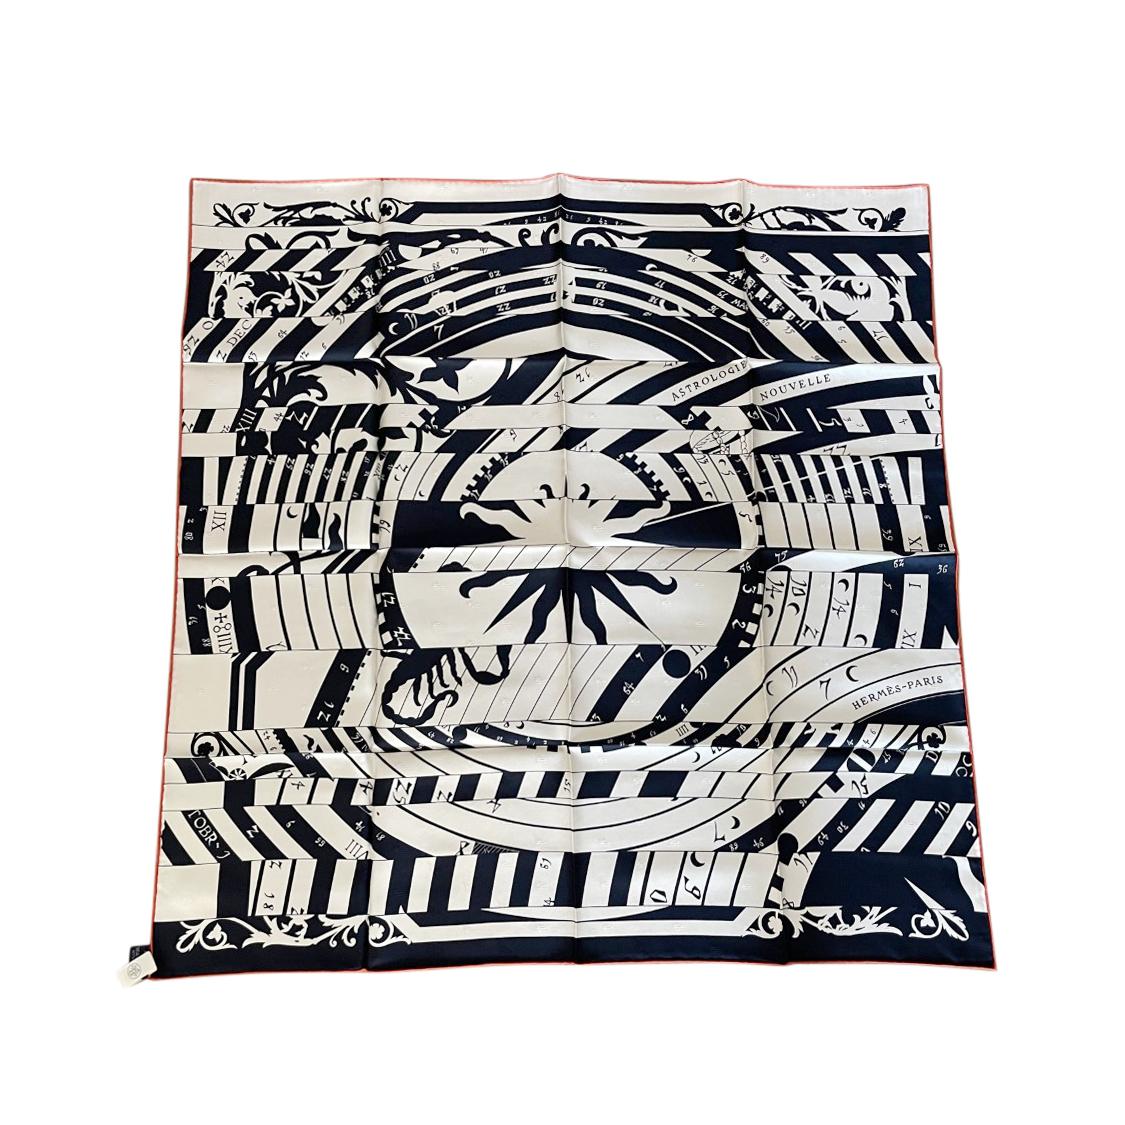 Hermes Sold Out Astrologie Nouvelle Silk Scarf 90